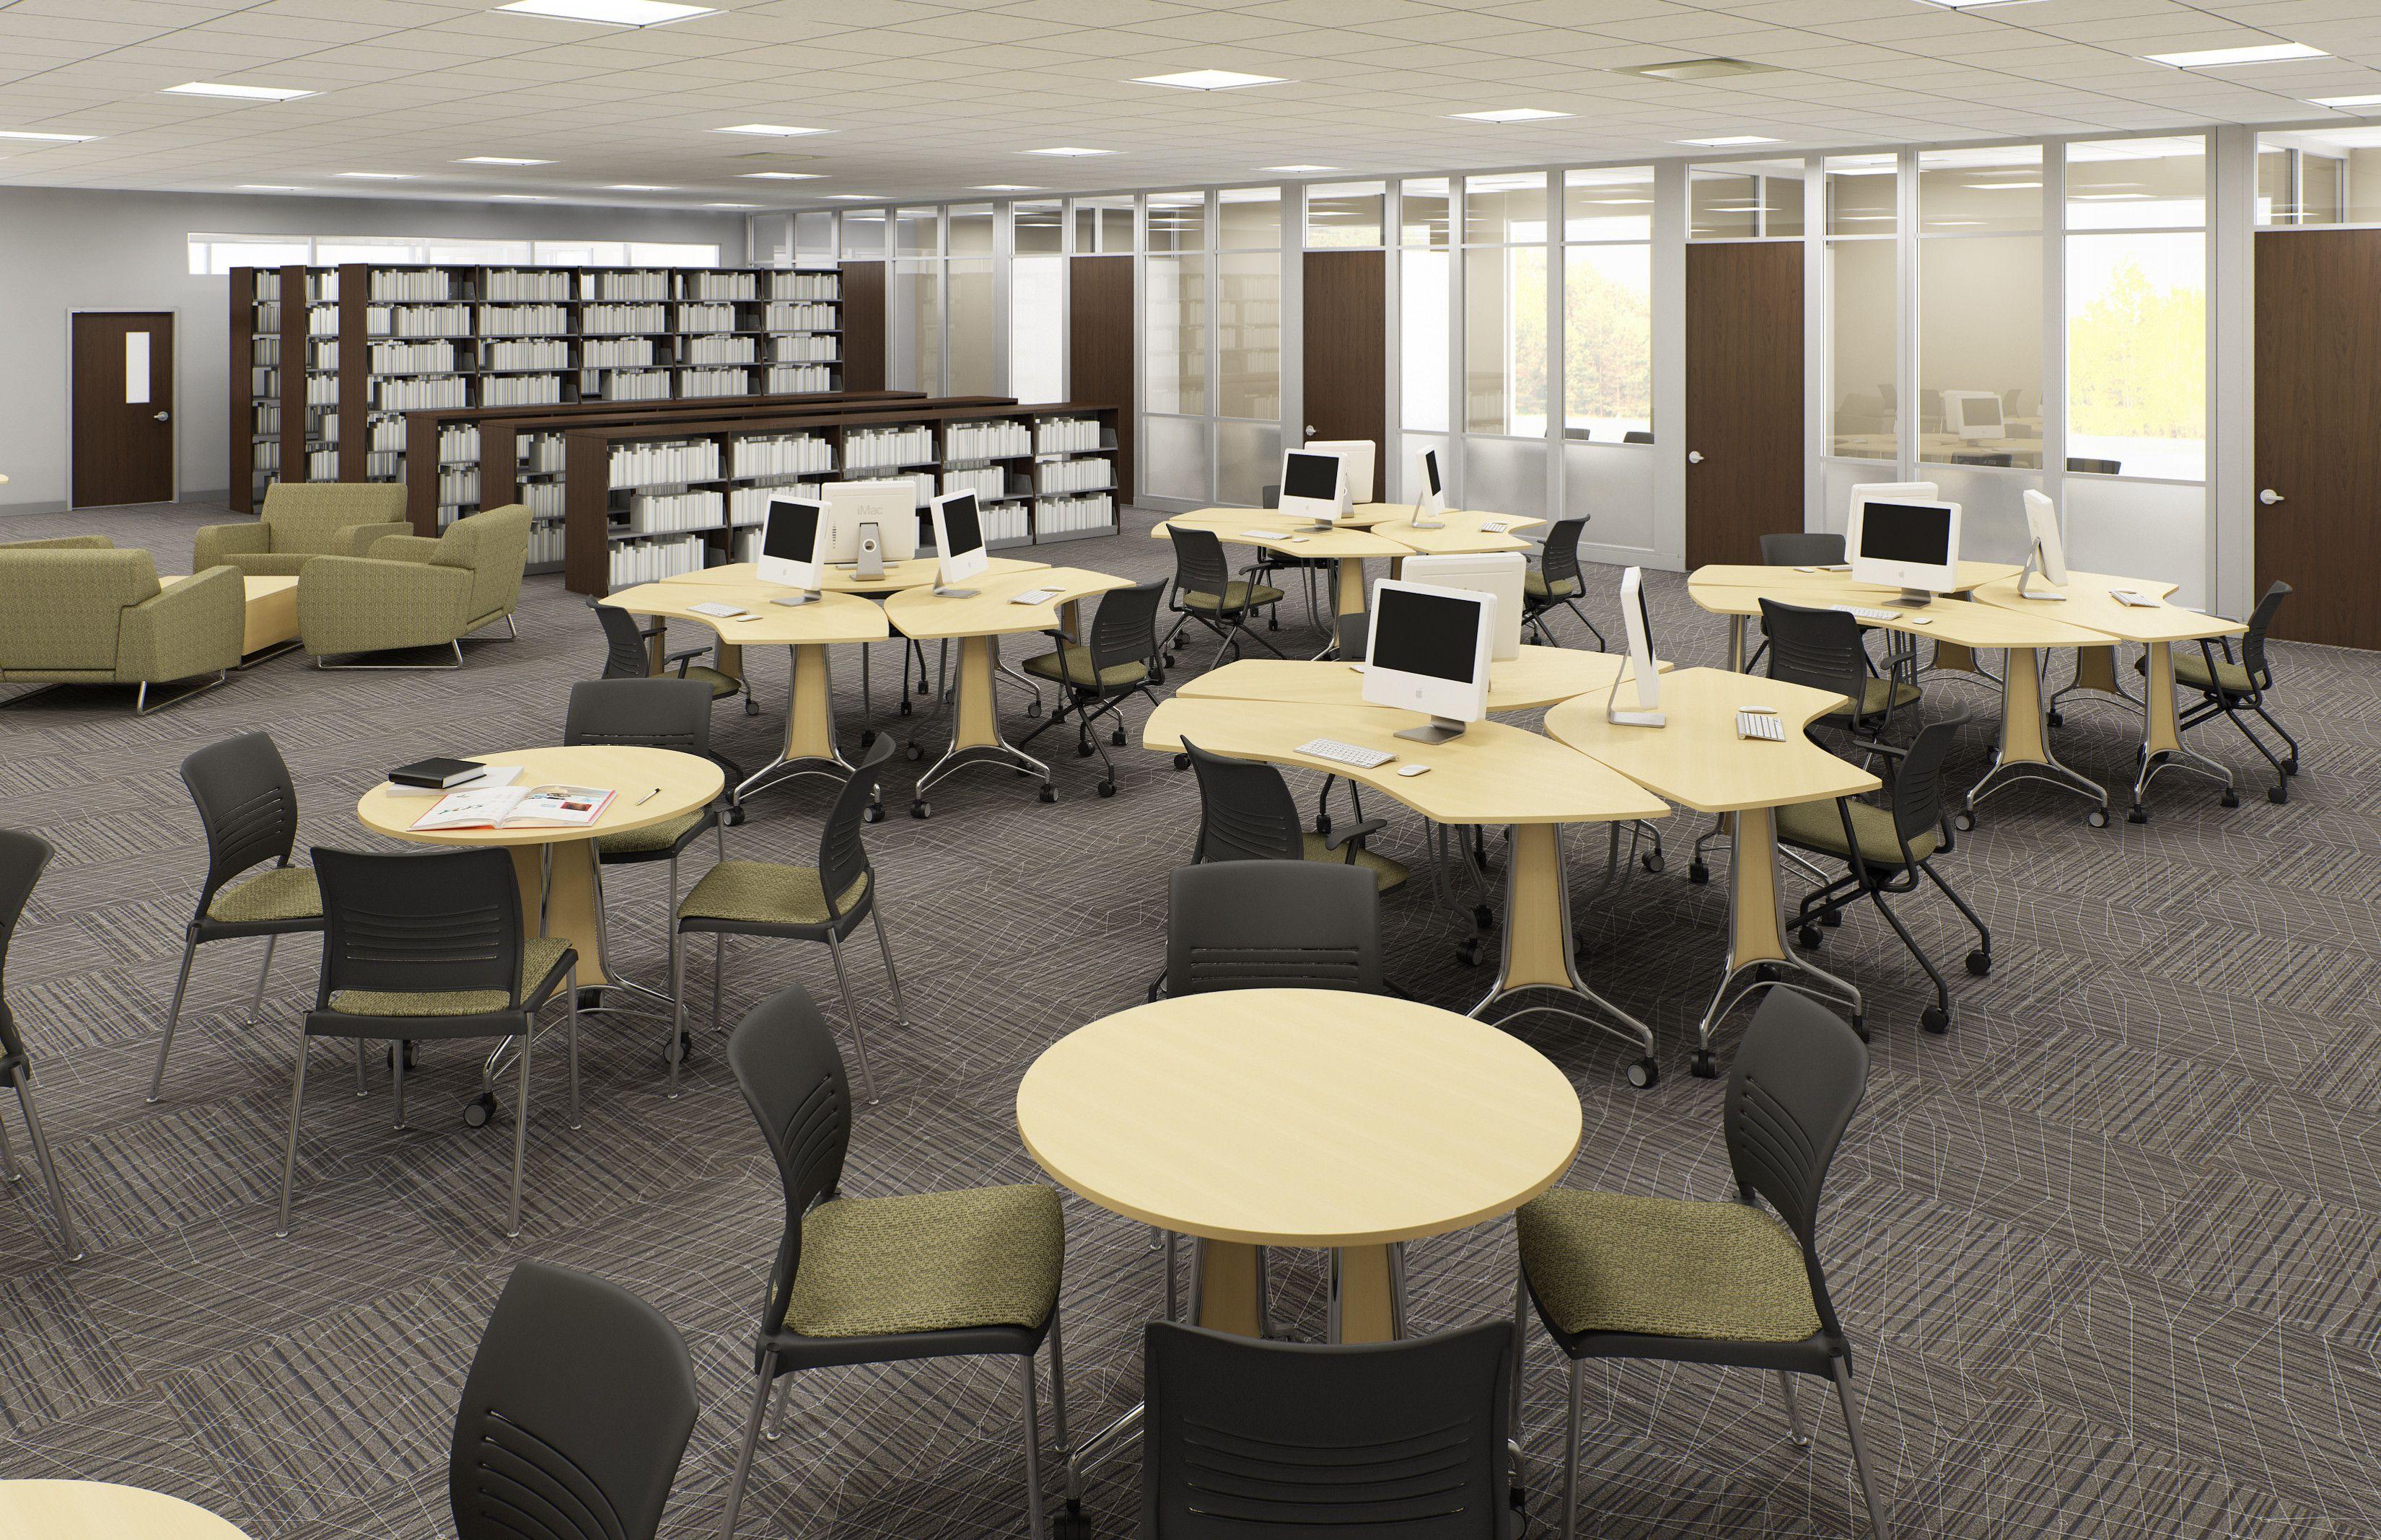 Kay Twelve.com Use Single Desks And Group Desks To Create A Diverse Seating